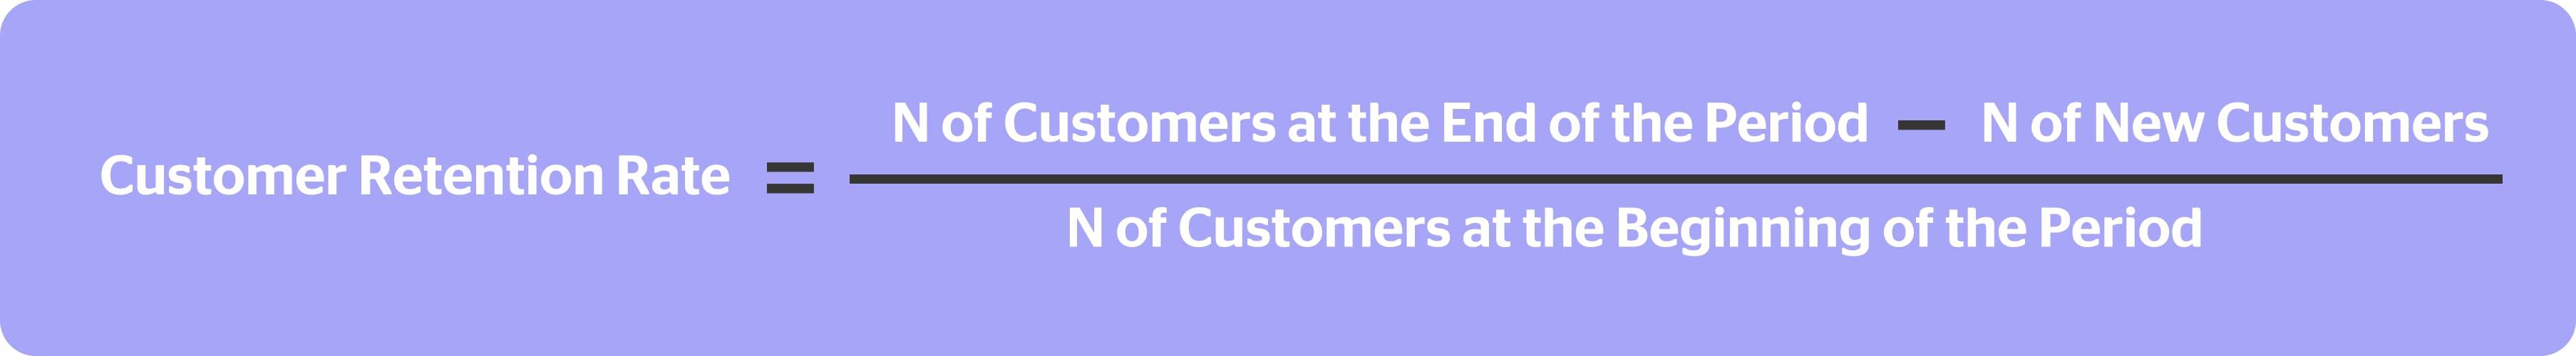 retention rate formula kpi for customer service